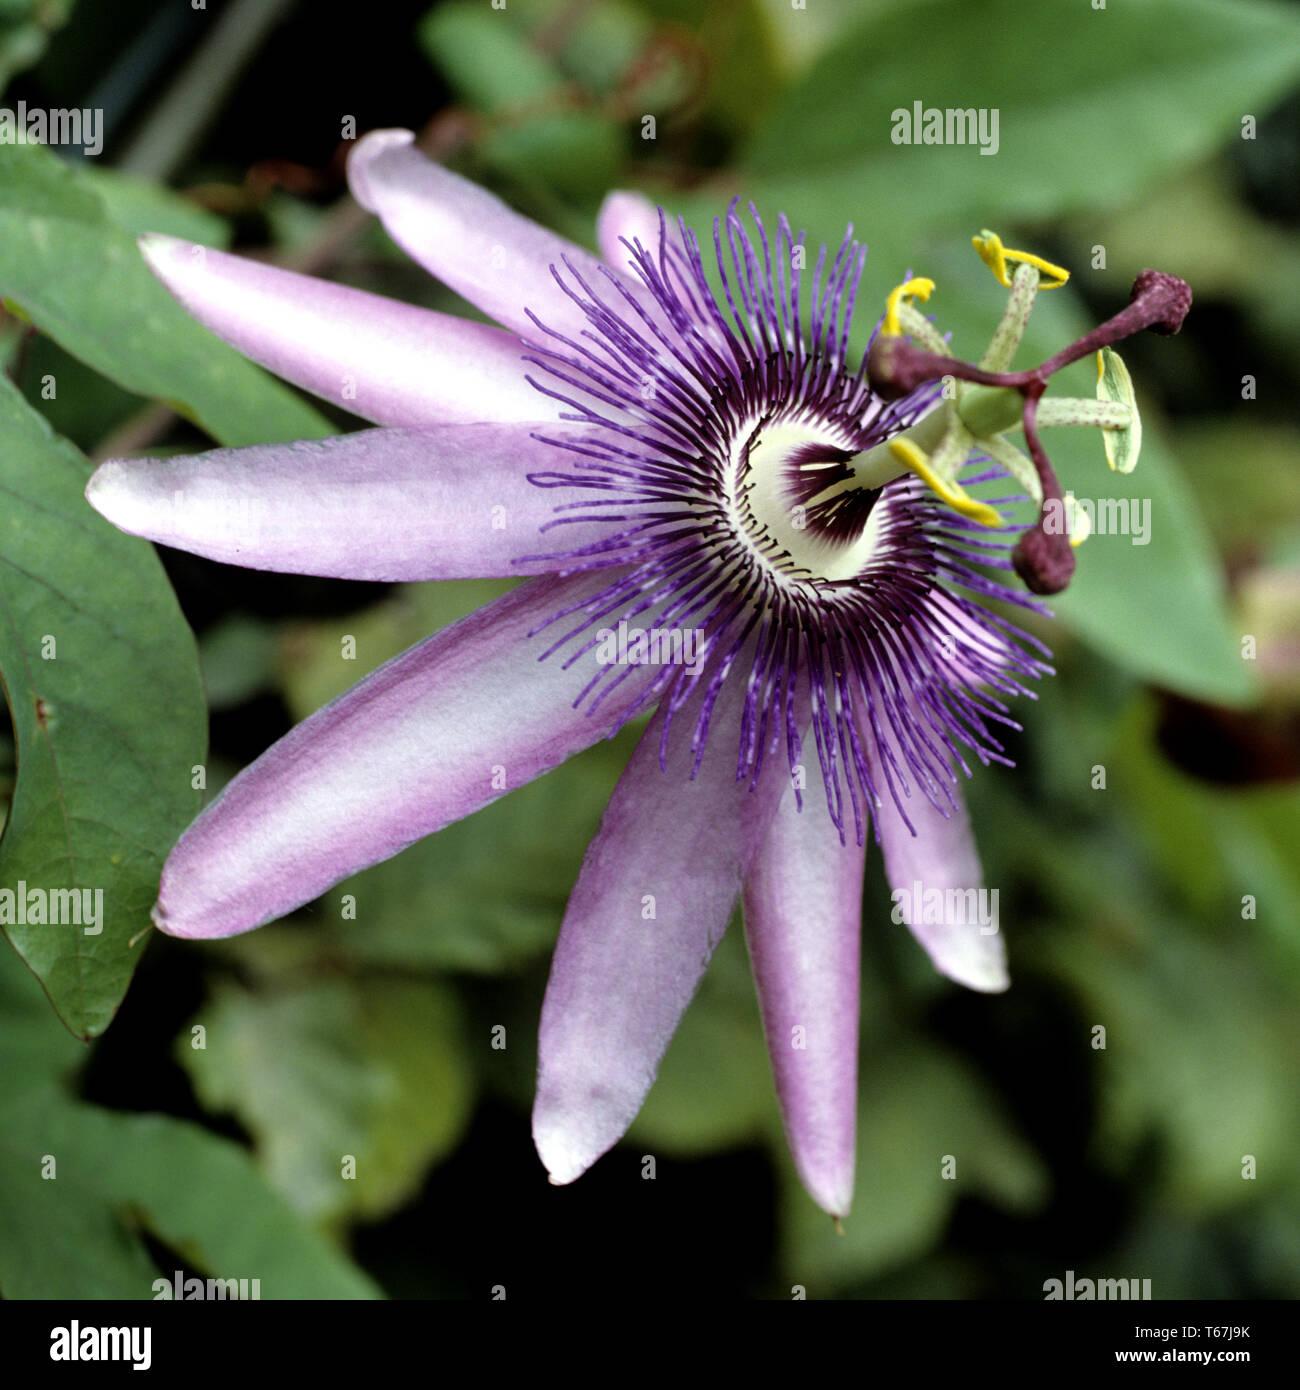 violet passion flower (Passiflora Violacea) Stock Photo